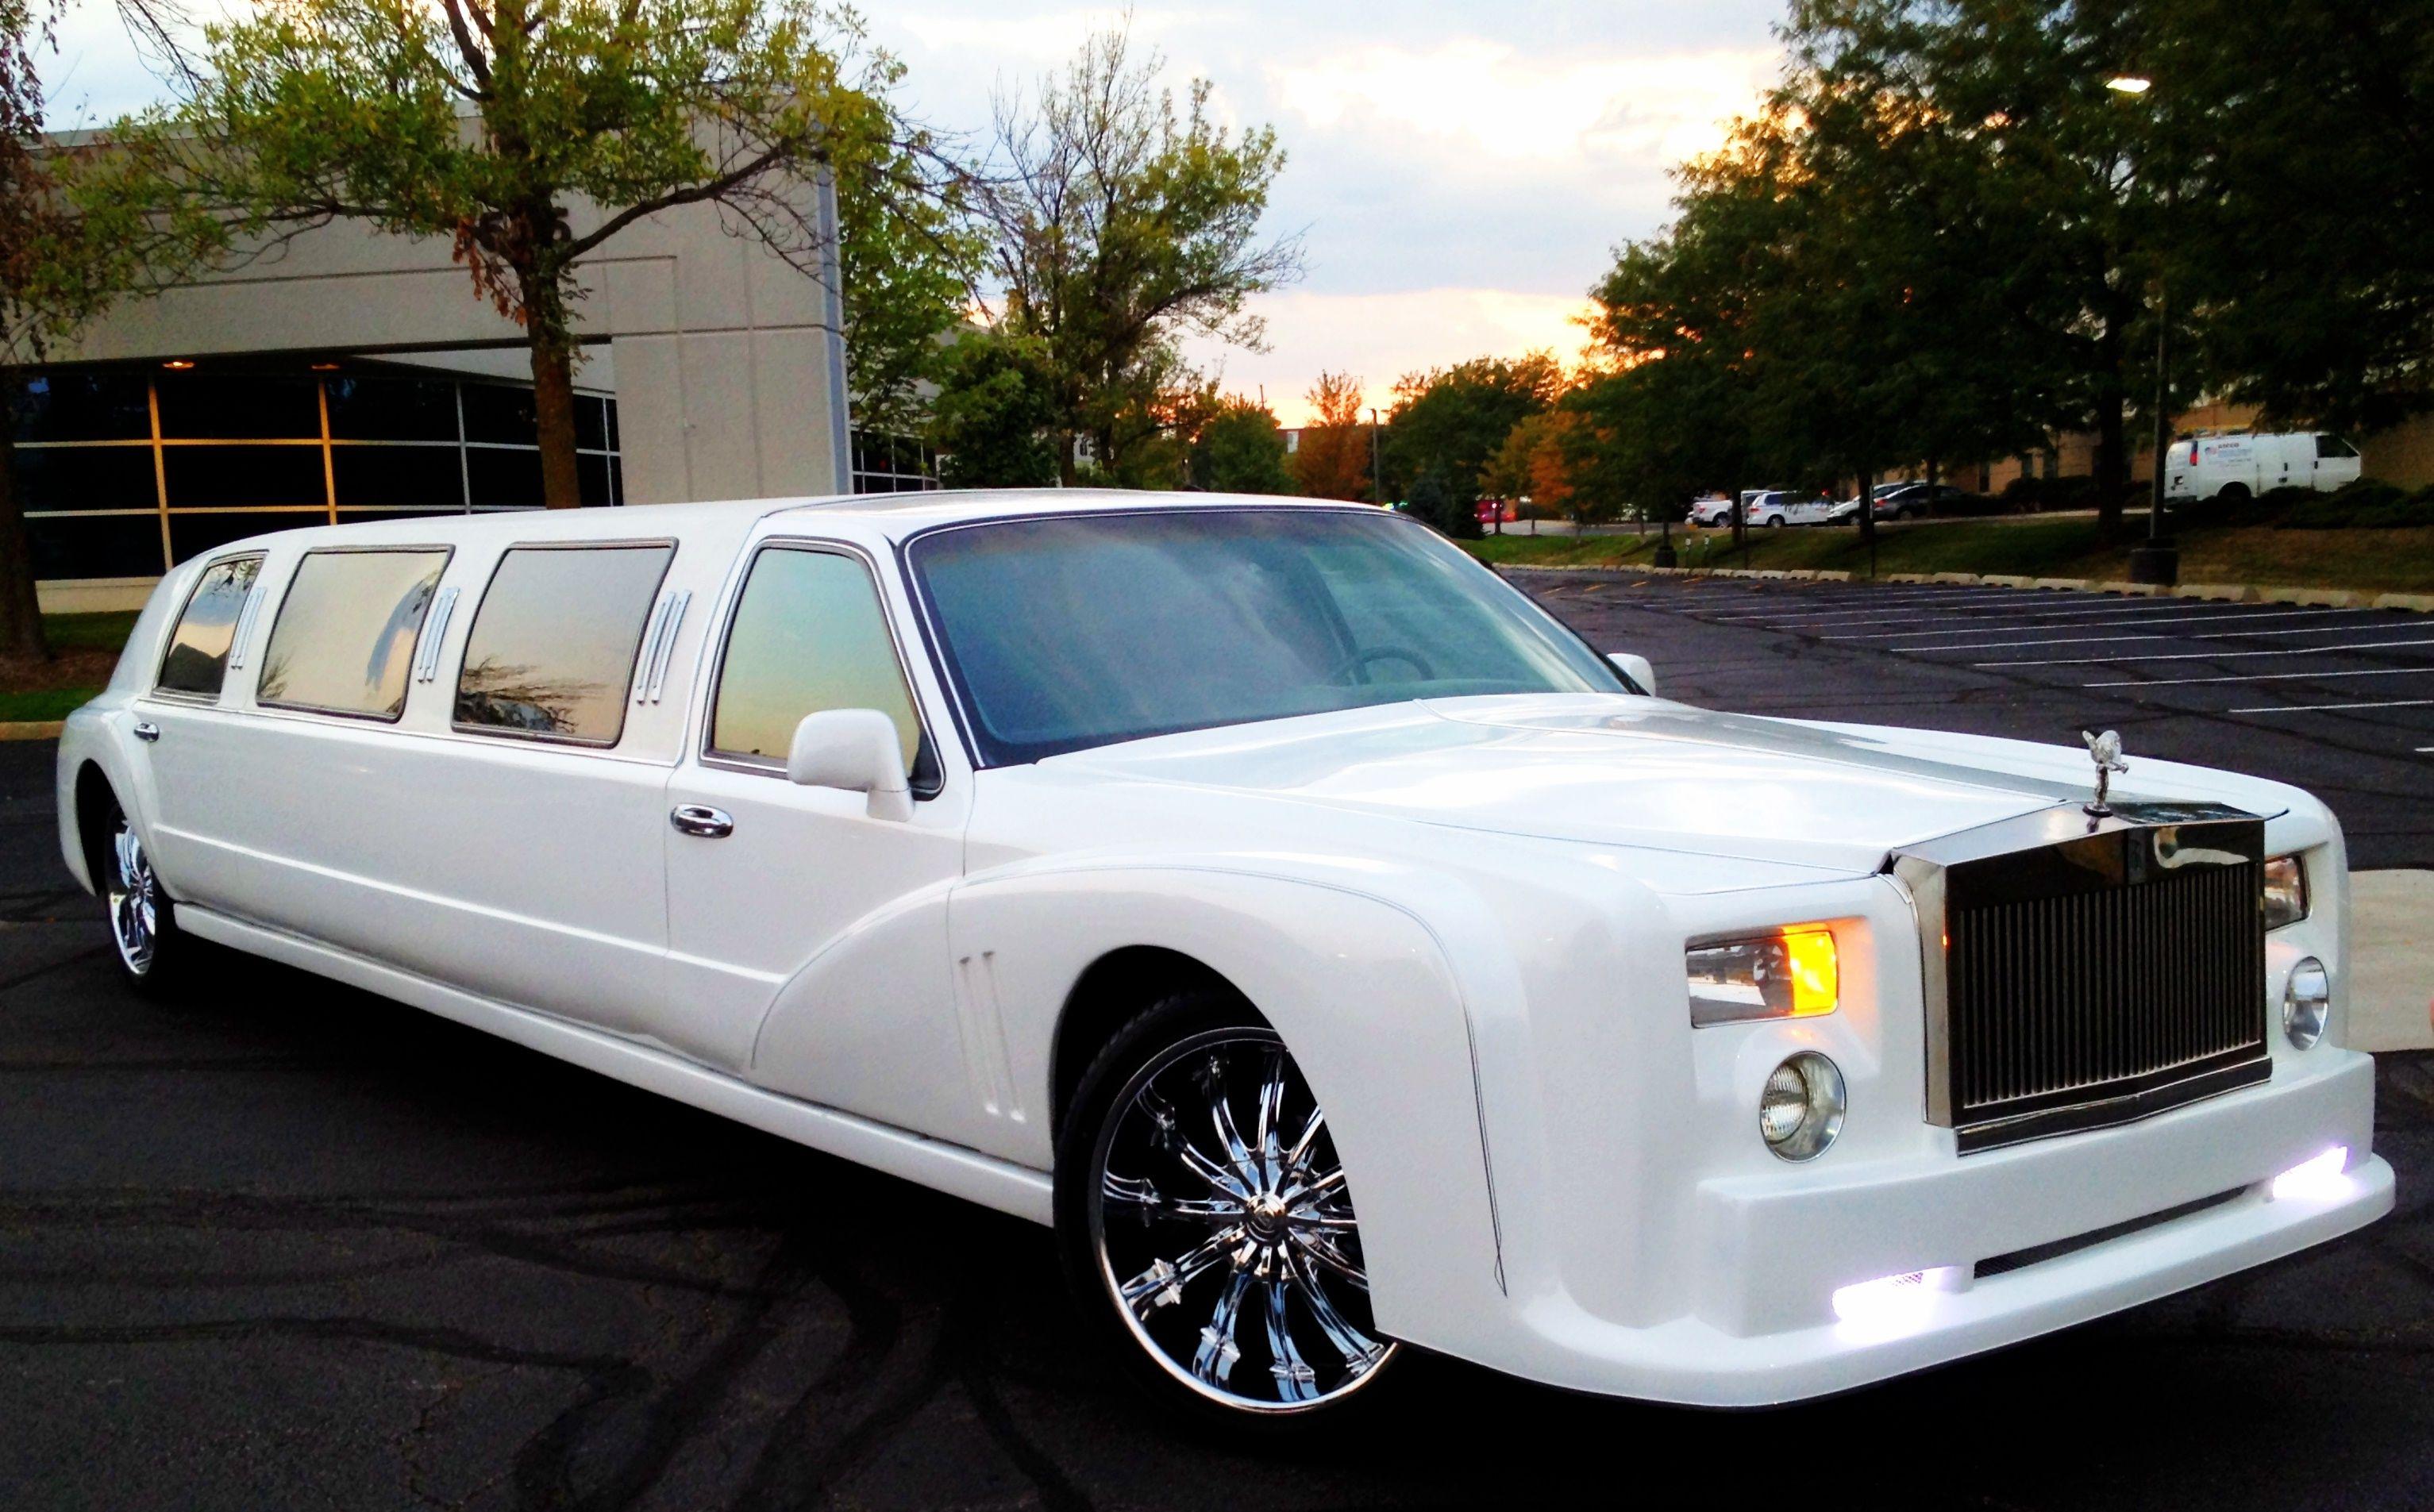 royce philadelphia exotic wraith lifestyles chicago img rolls rental car bentley in imagine